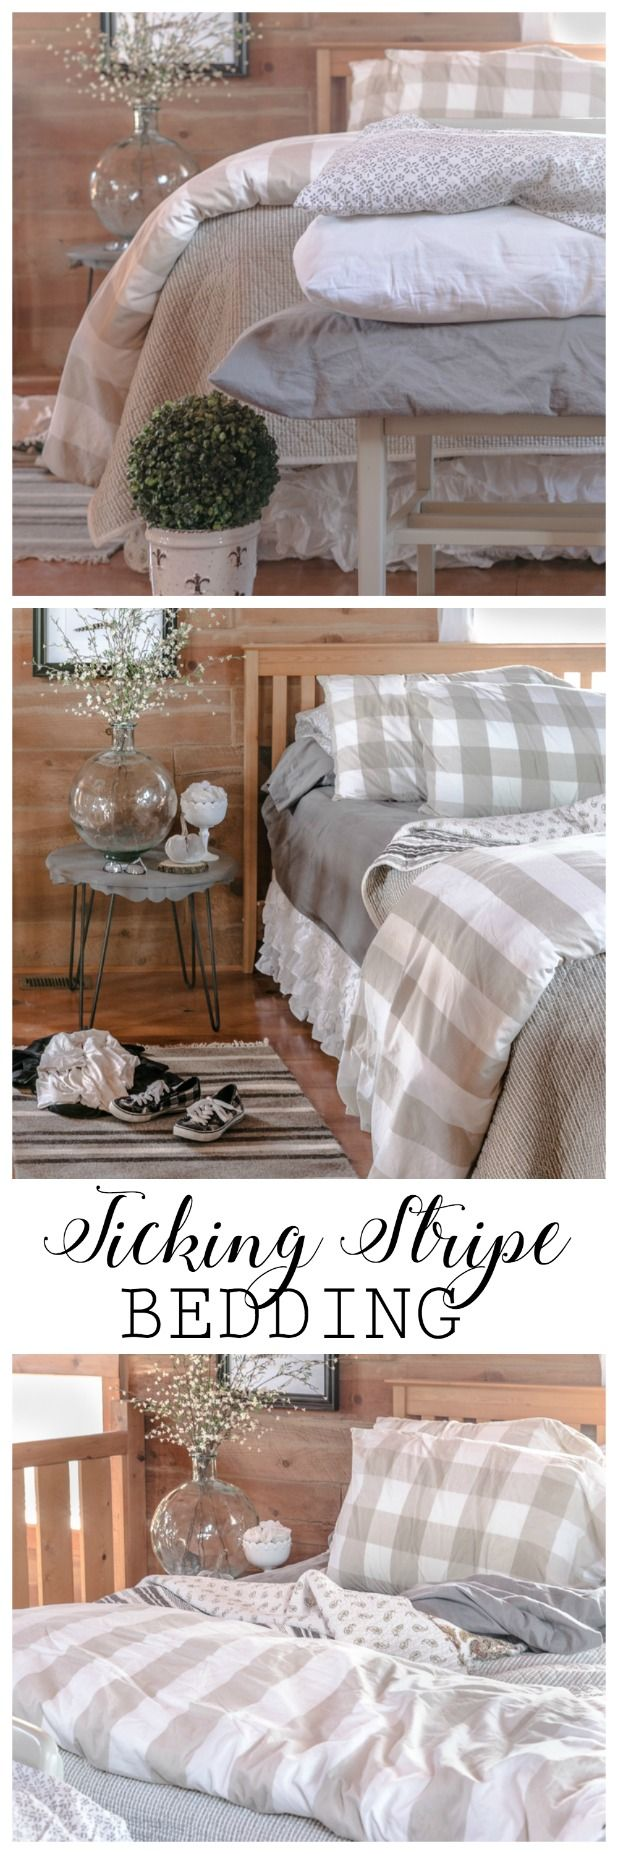 Matrimonio Bed Linen : Ticking stripe bedding pinterest habitaciones